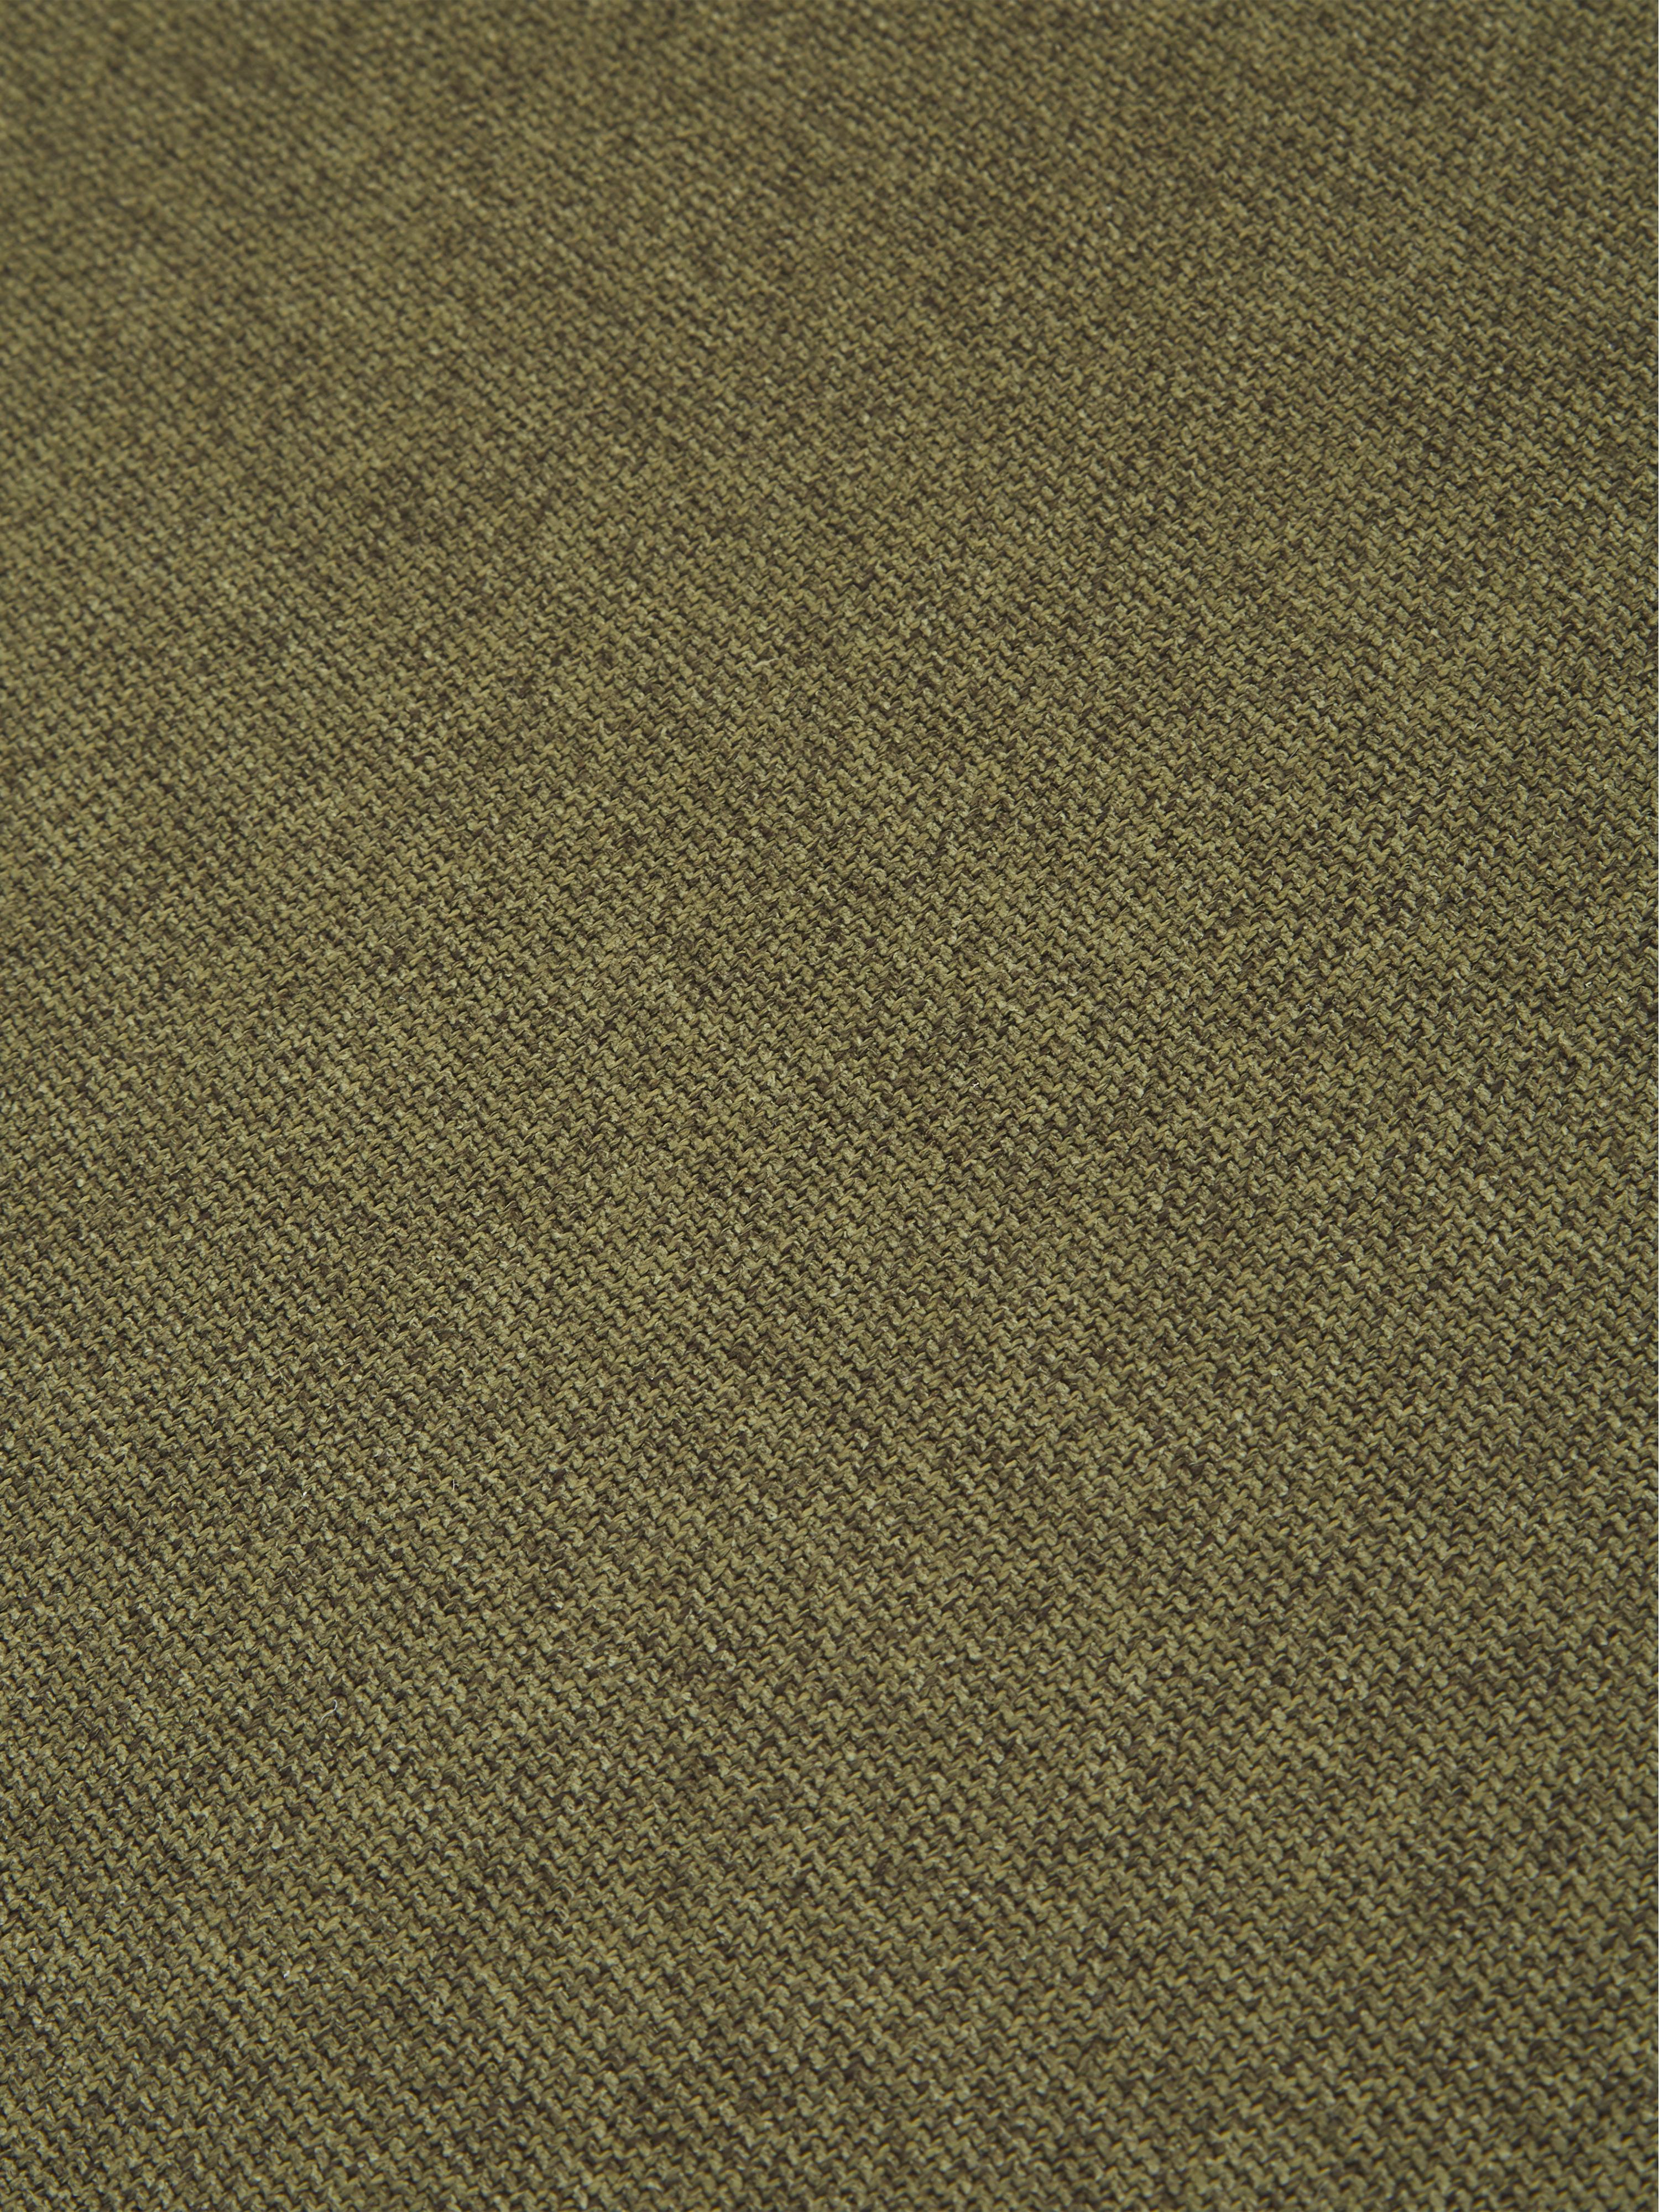 Modulares Ecksofa Lennon, Bezug: Polyester 35.000 Scheuert, Gestell: Massives Kiefernholz, Spe, Füße: Kunststoff, Webstoff Grün, B 238 x T 180 cm